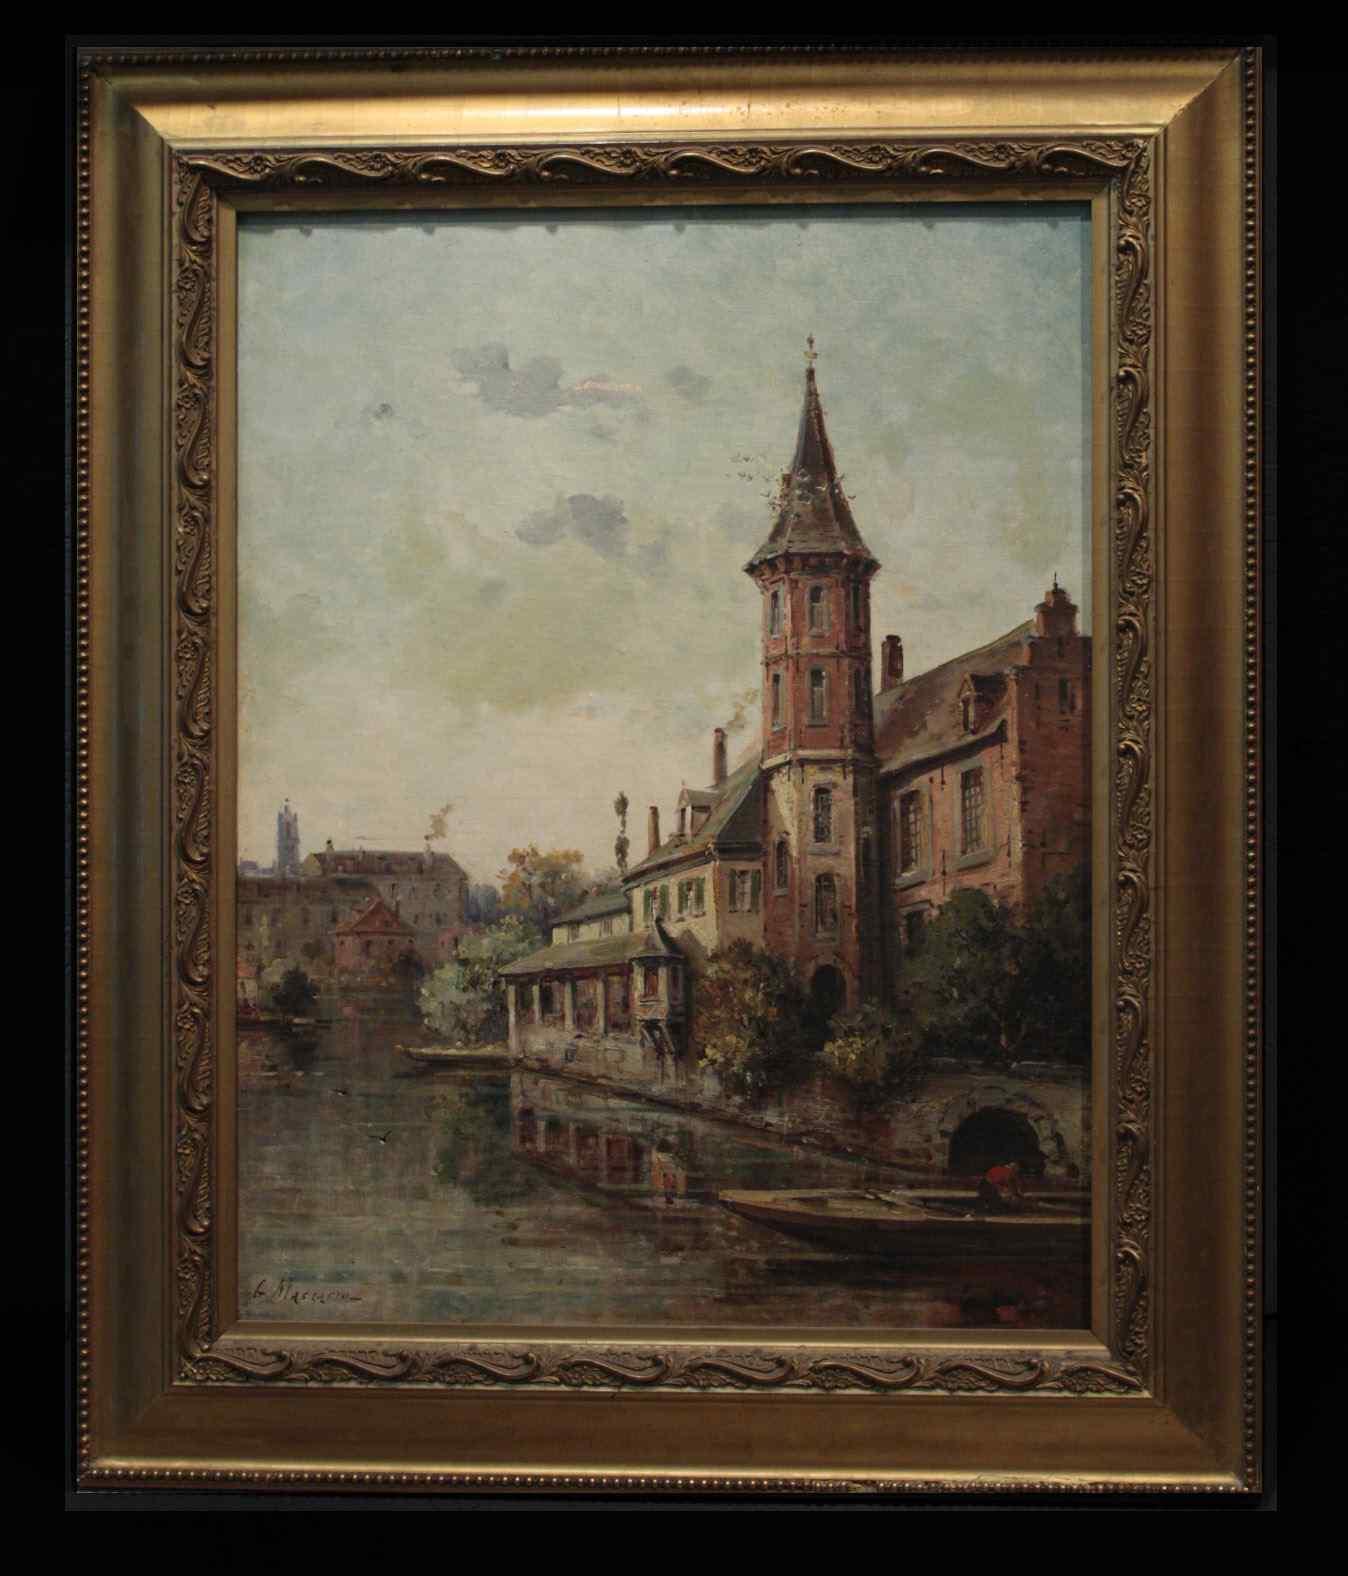 Giuseppe Mascarini (1877-1954) - View of Pouilly-sur Loire